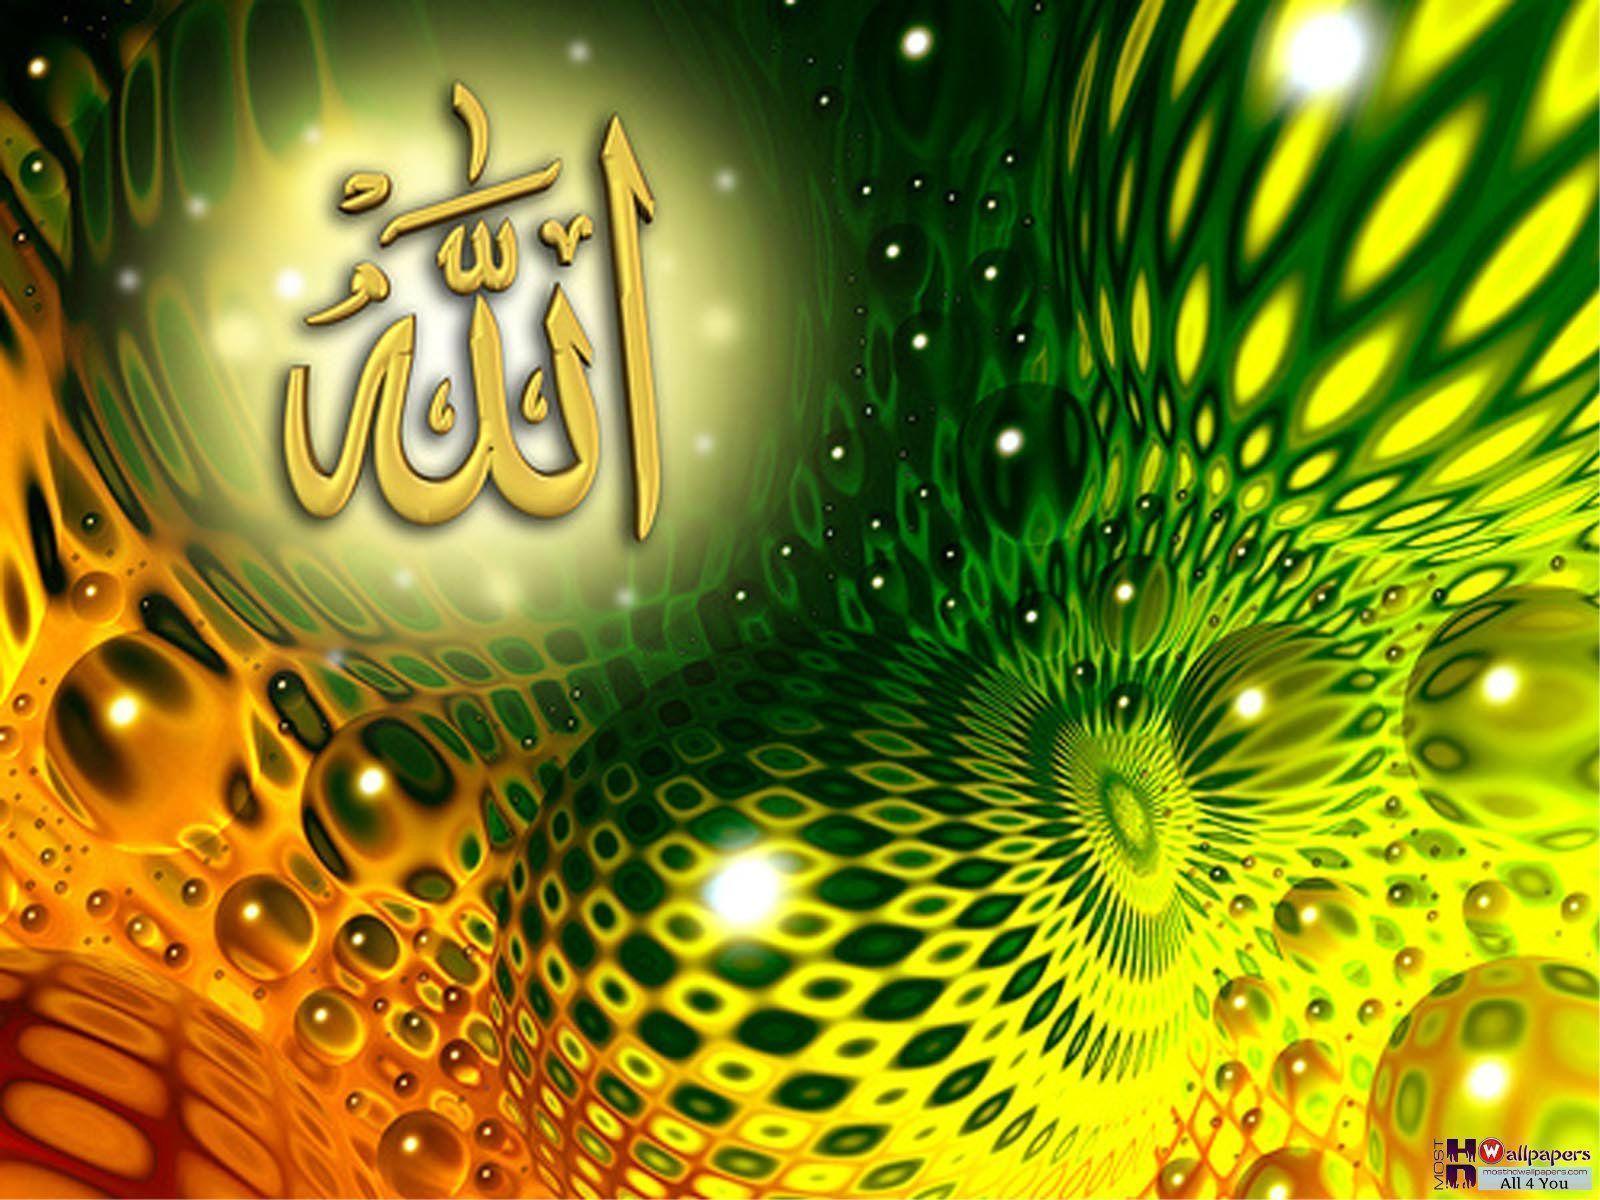 Beautiful ALLAH Wallpapers | Most HD Wallpapers Pictures Desktop ...